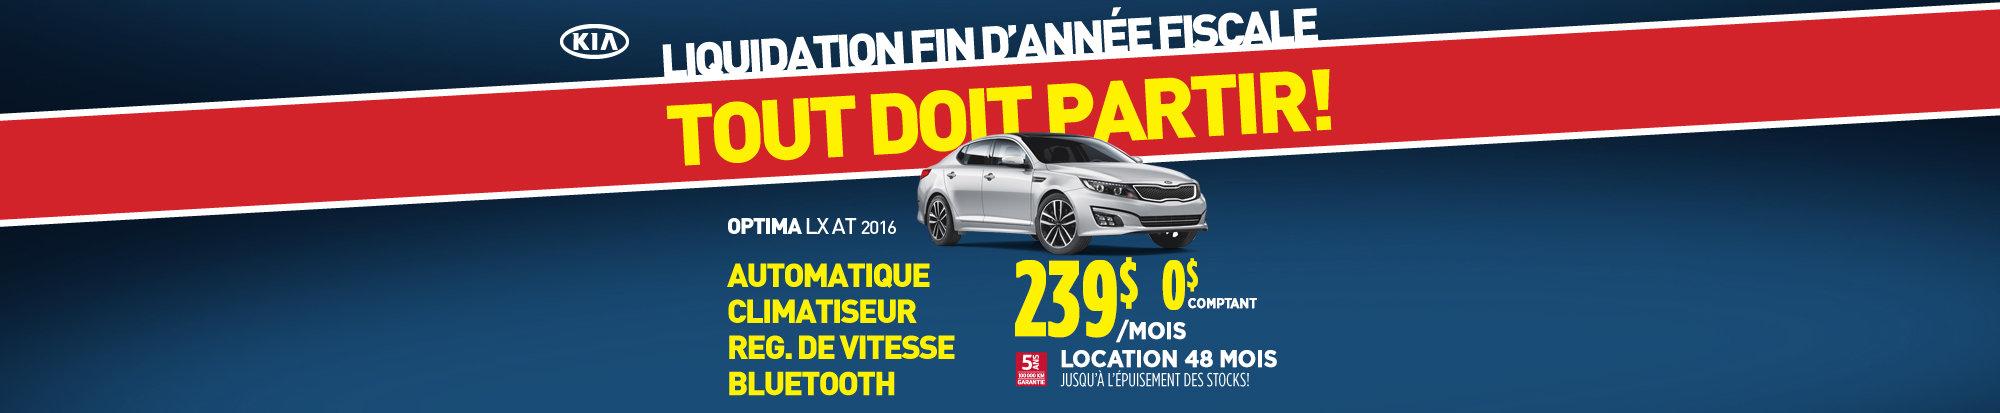 Liquidation fin d'année: Kia Optima LX 2016